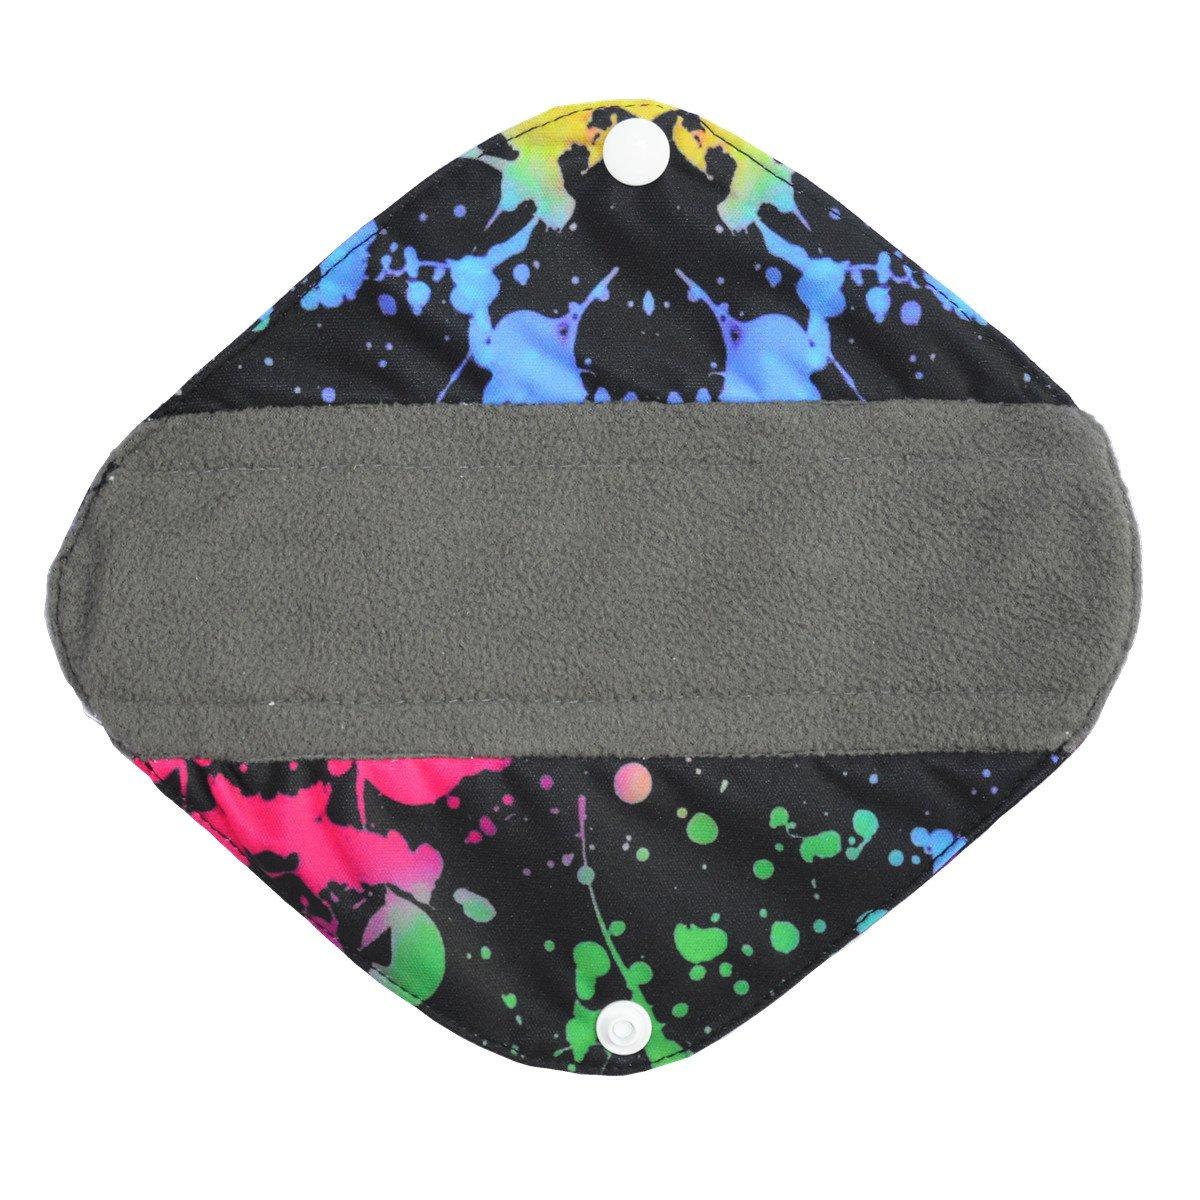 6pcs 10 Inch Regular Charcoal Bamboo Mama Cloth//Menstrual Pads//Reusable Sanitary Pads 7pcs Set 1pc Mini Wet Bag Solid